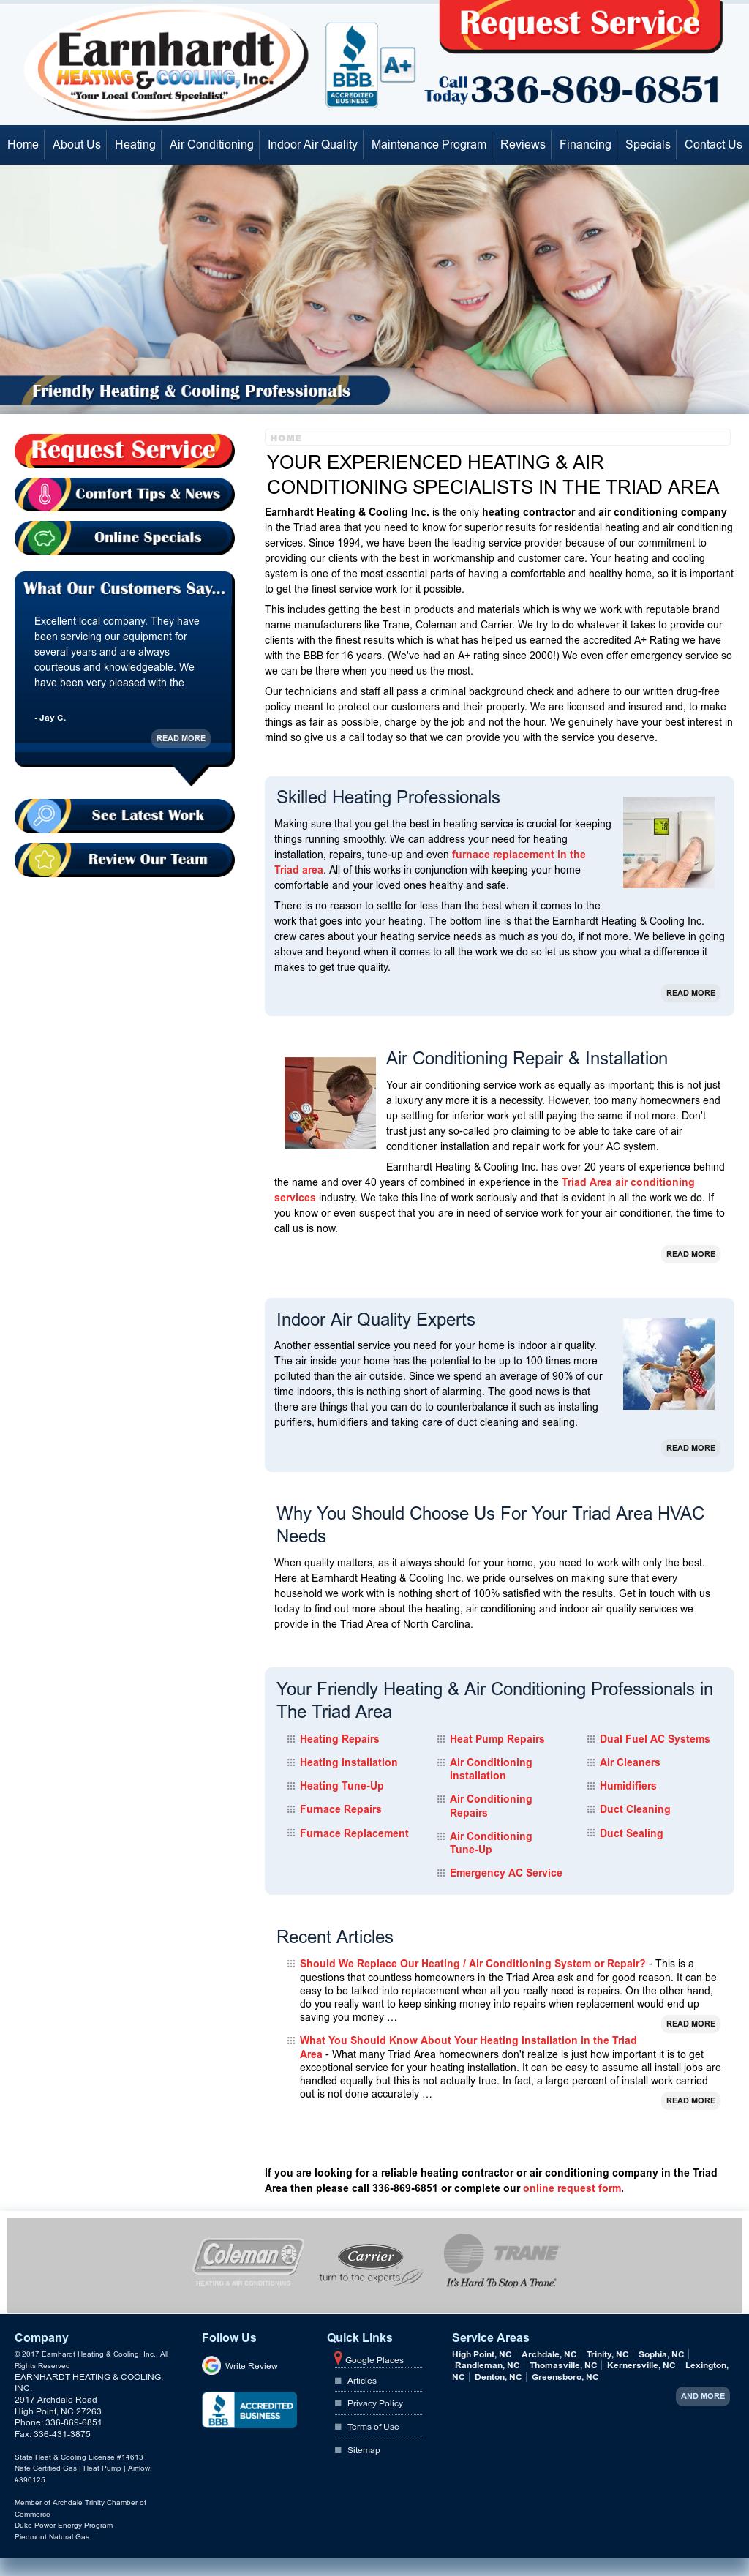 Earnhardt Heating Cooling Website History